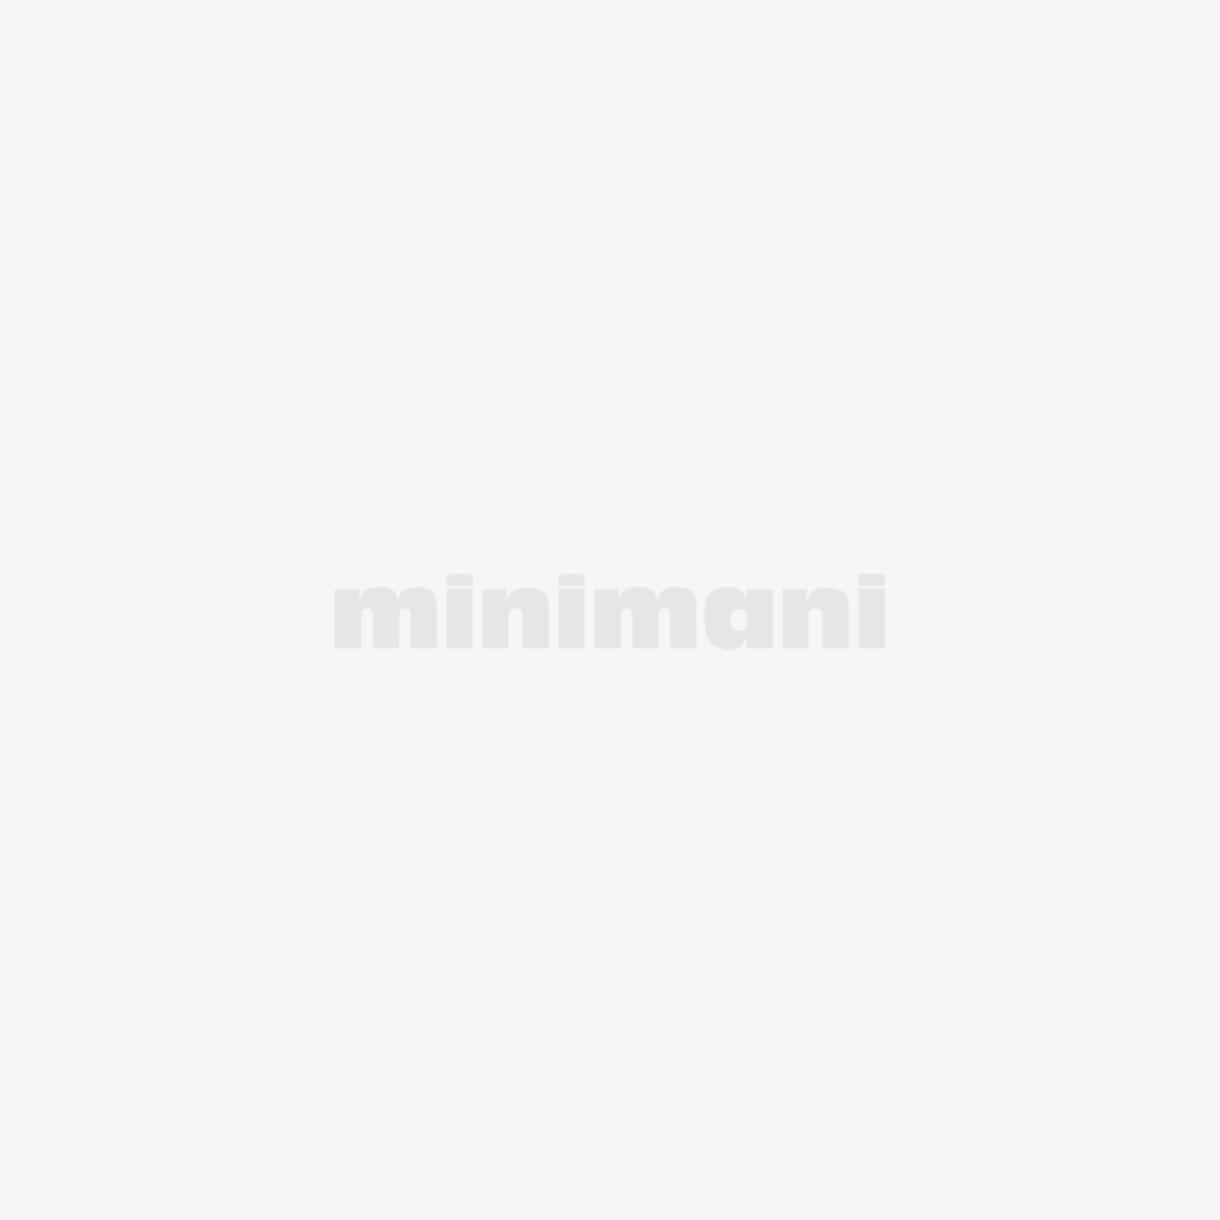 REMINGTON SP-FC4 MASSAGE HIERONTAOSA (FC1000 KASVOHARJAAN)